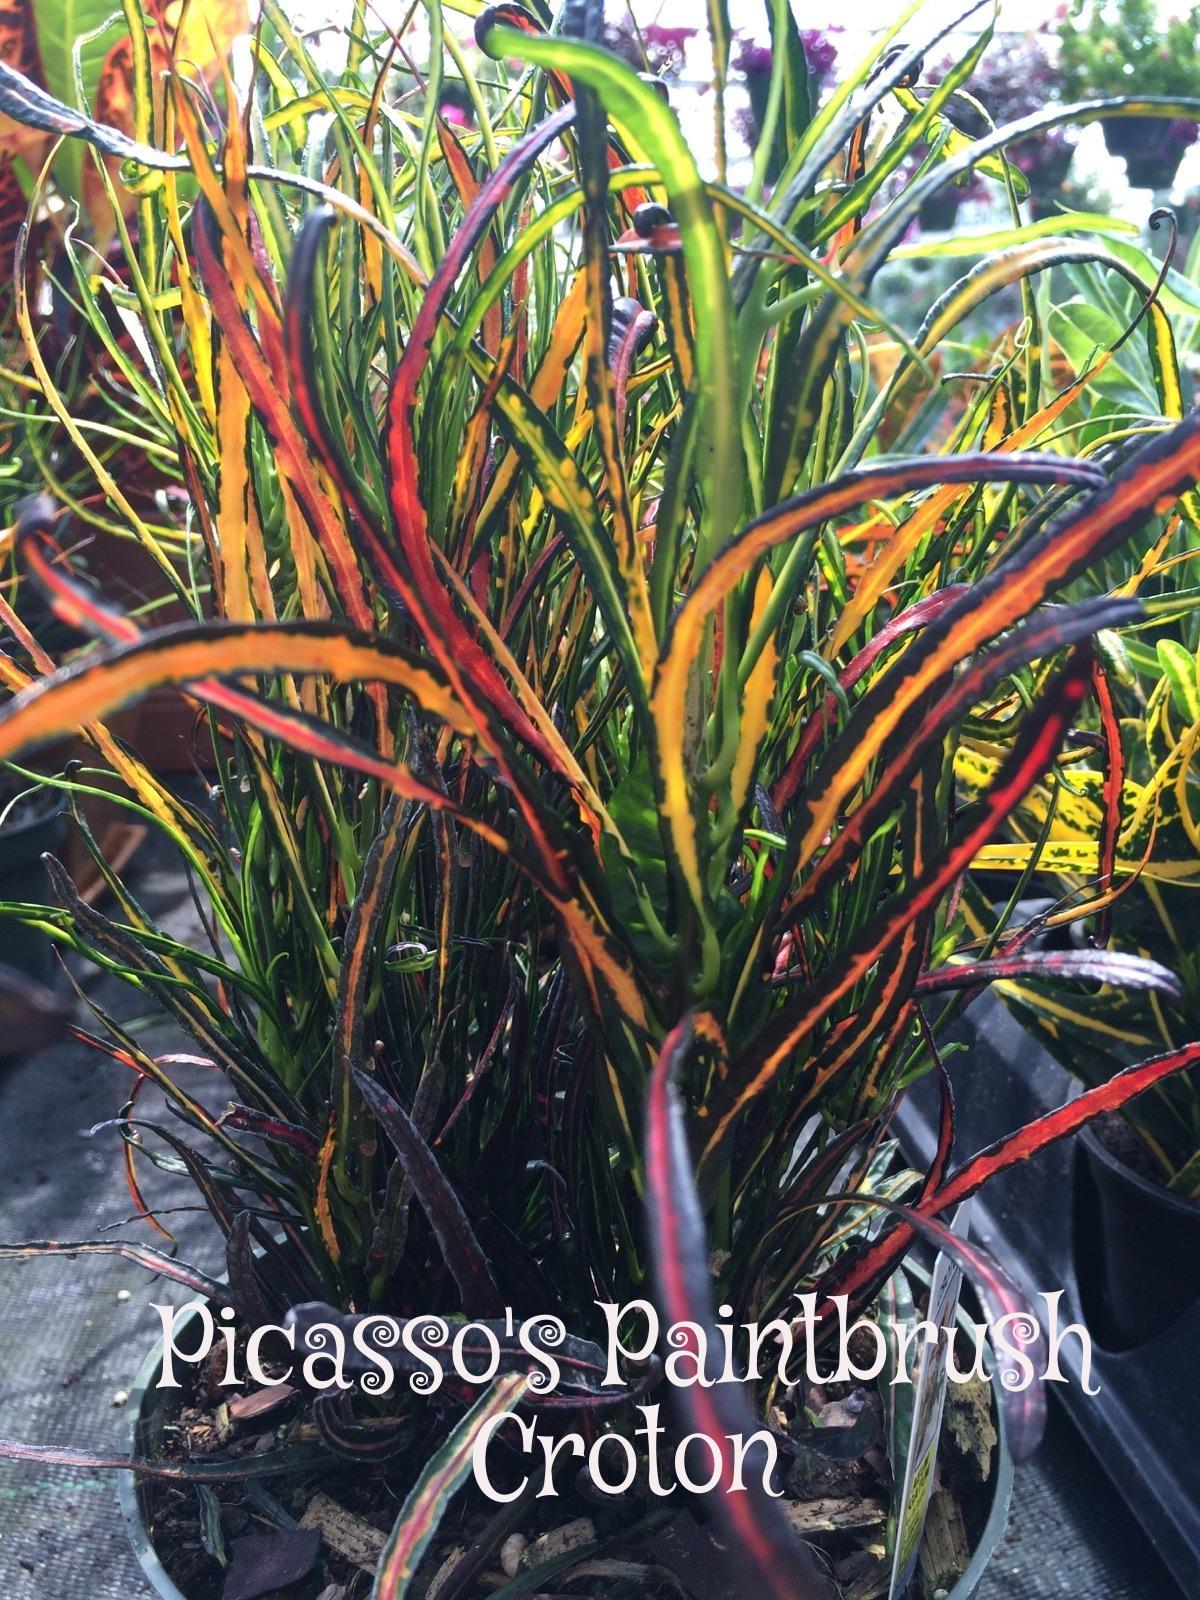 Picasso's Paintbrush Croton